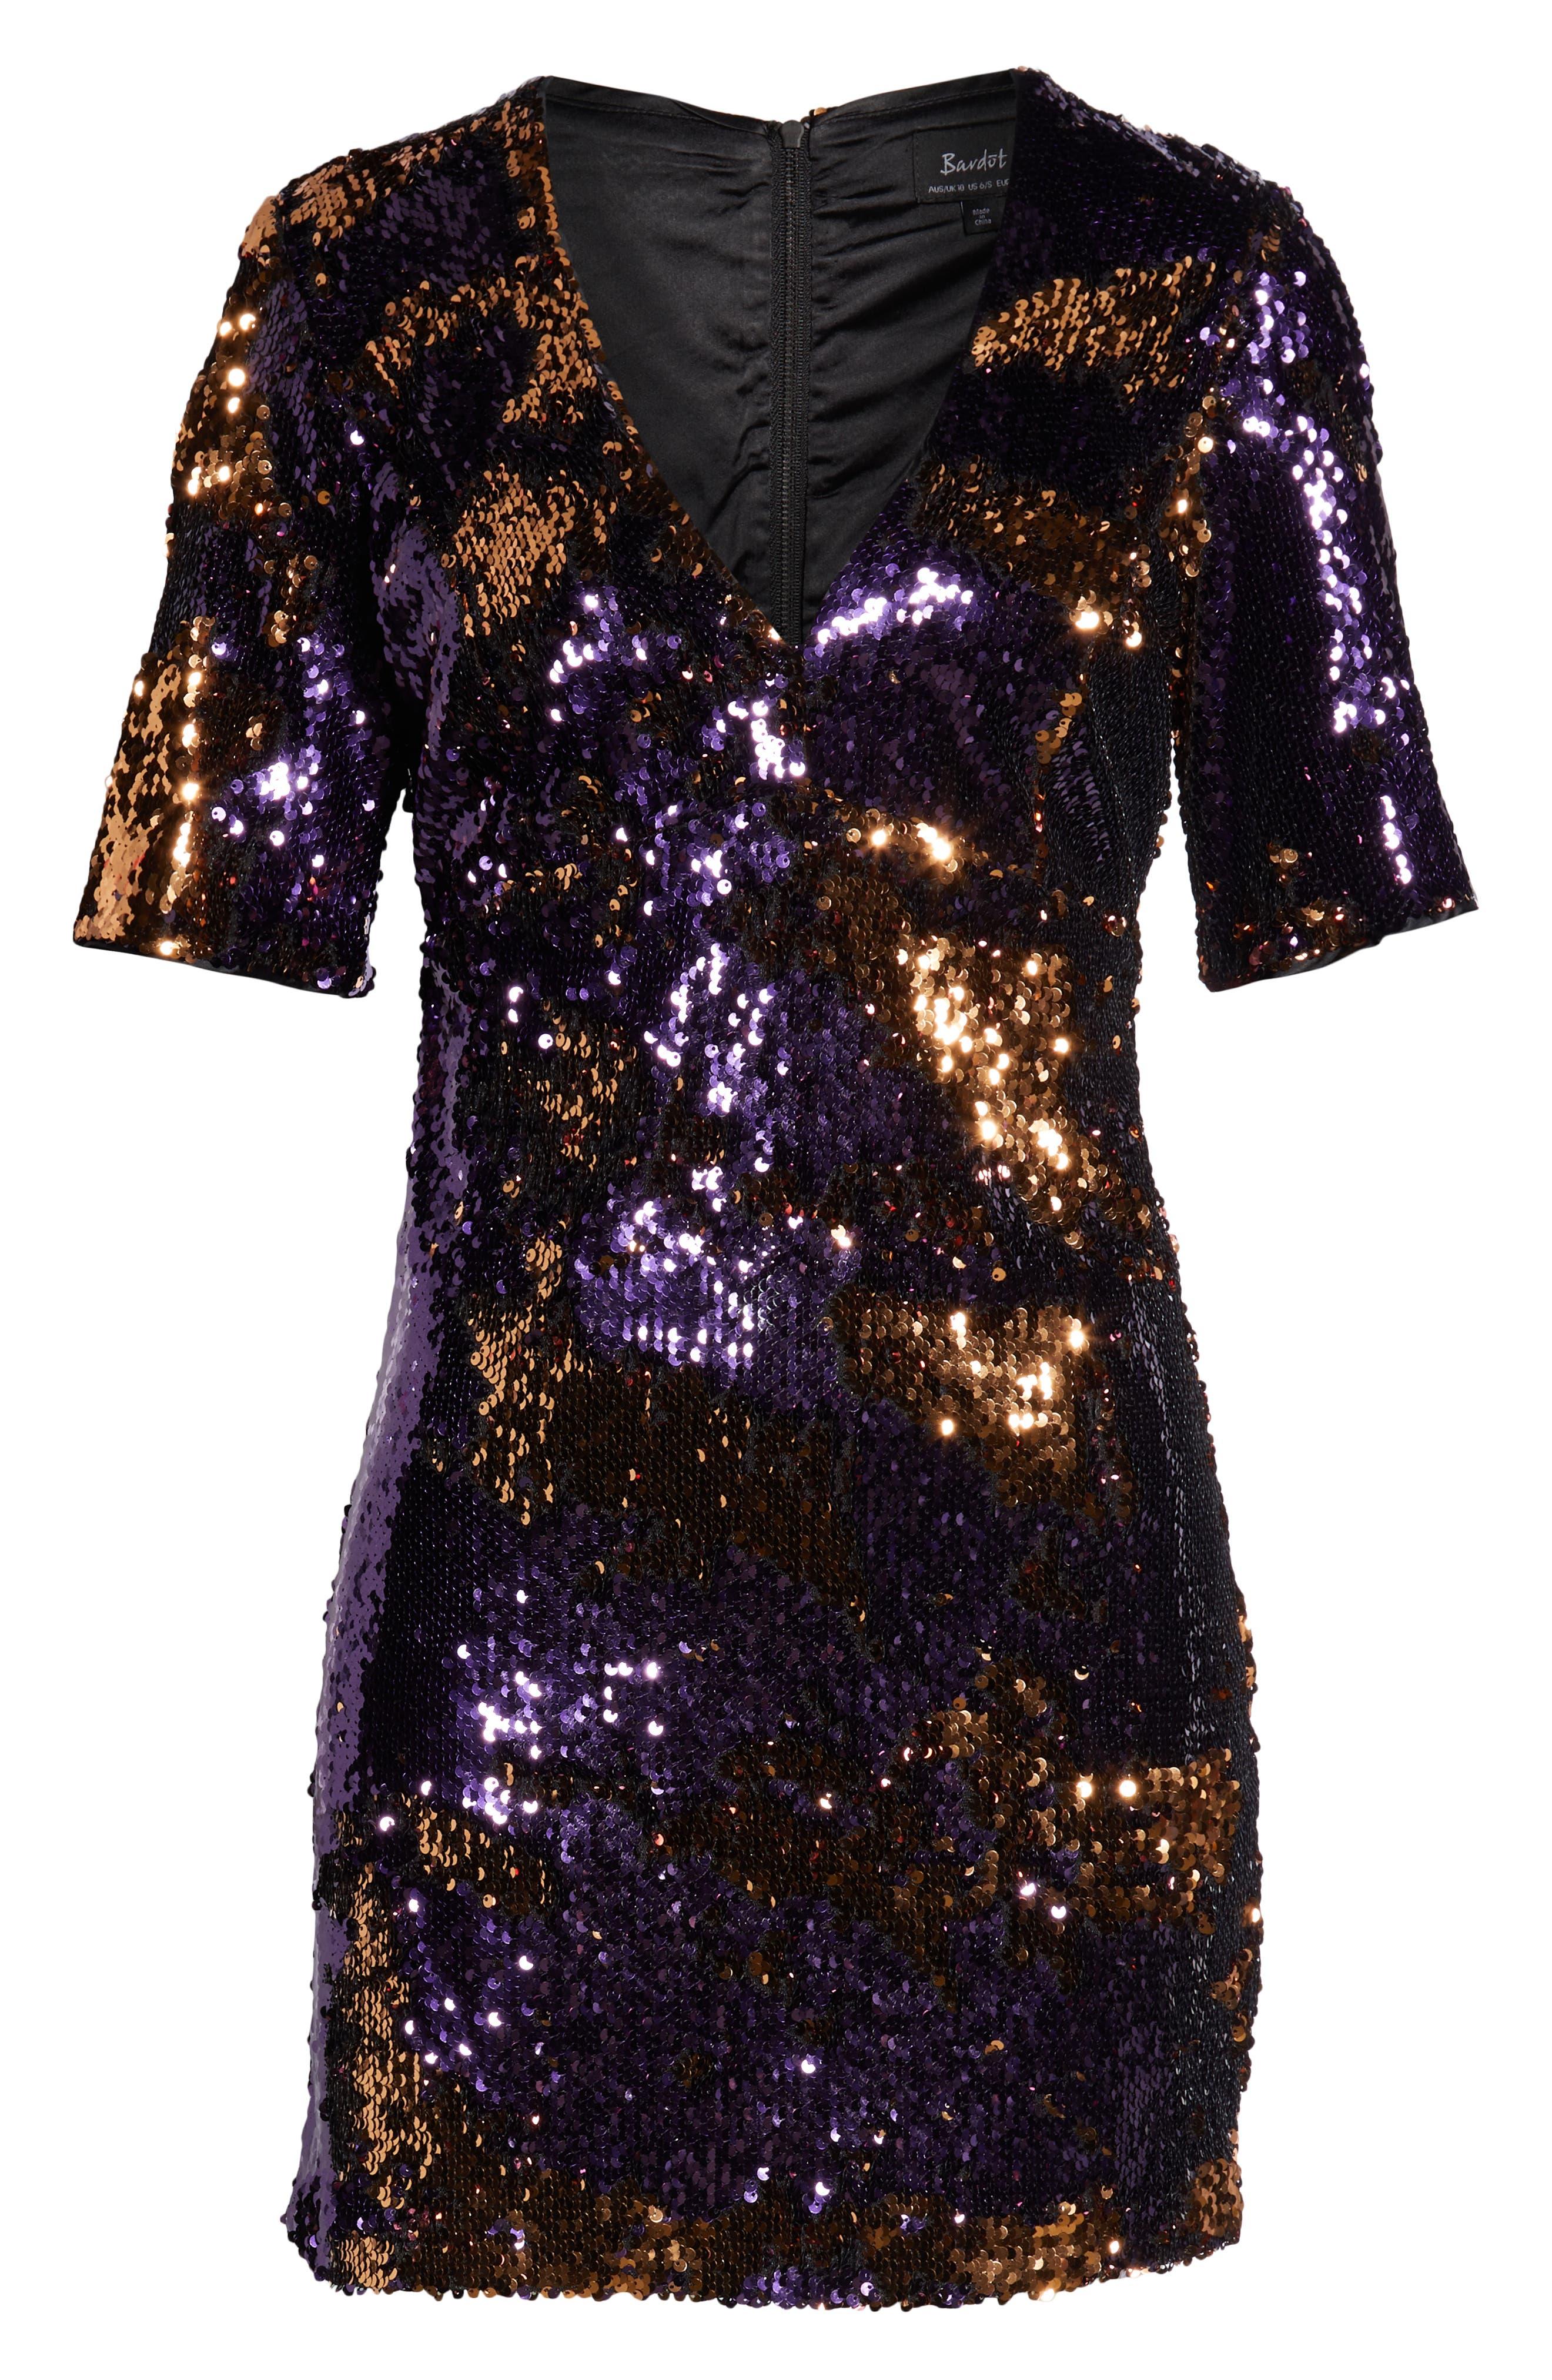 Sequin Embellished Dress,                             Alternate thumbnail 6, color,                             GOLD/ PURPLE